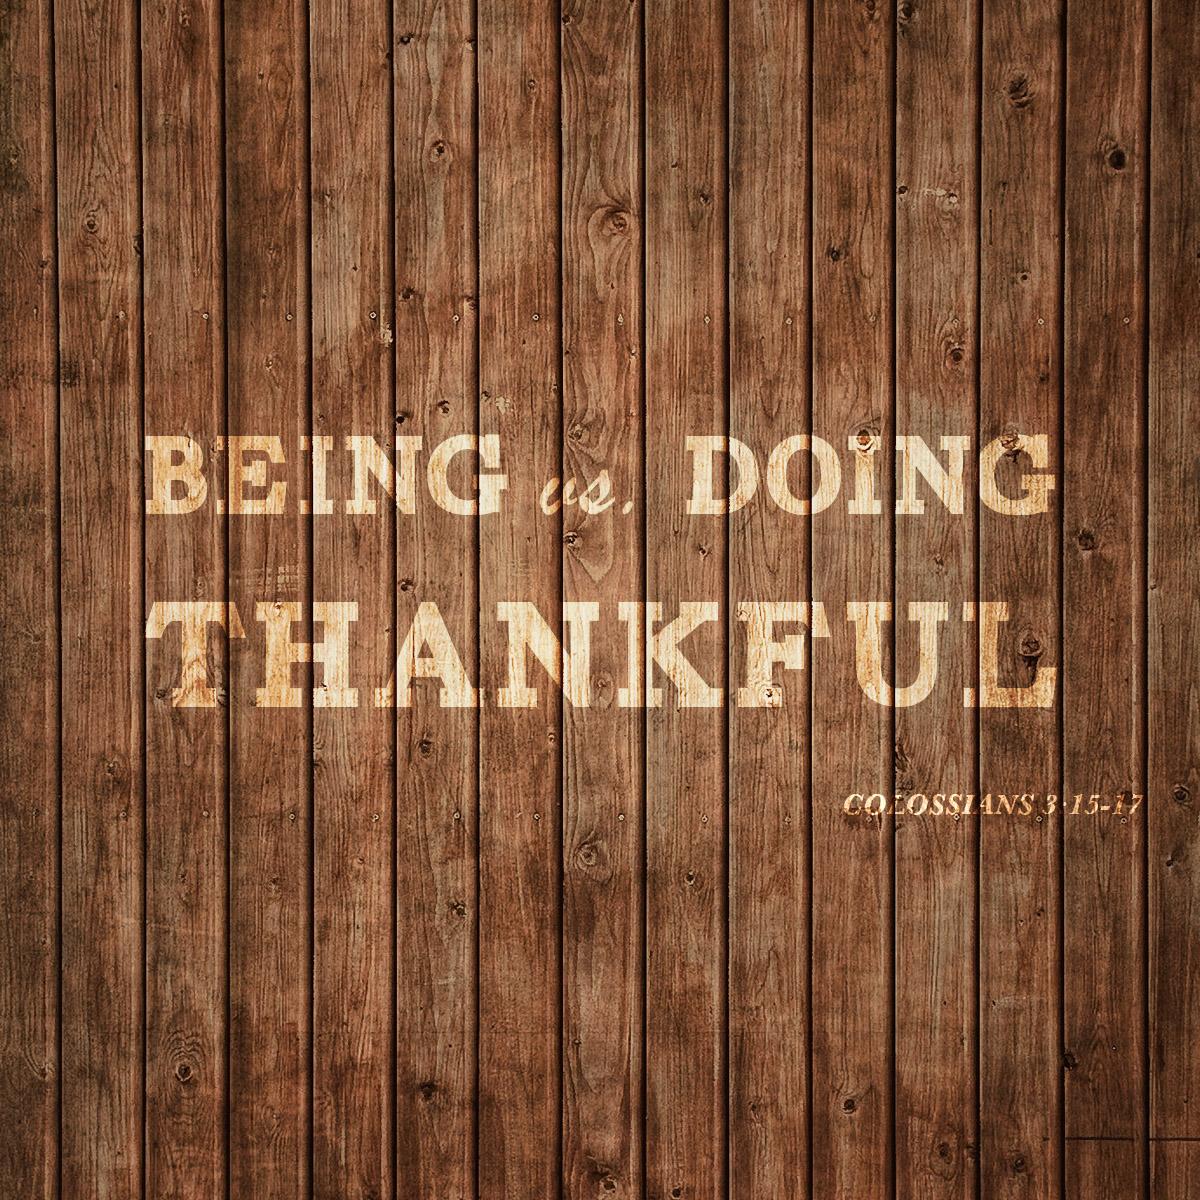 151202_Thanksgiving_new